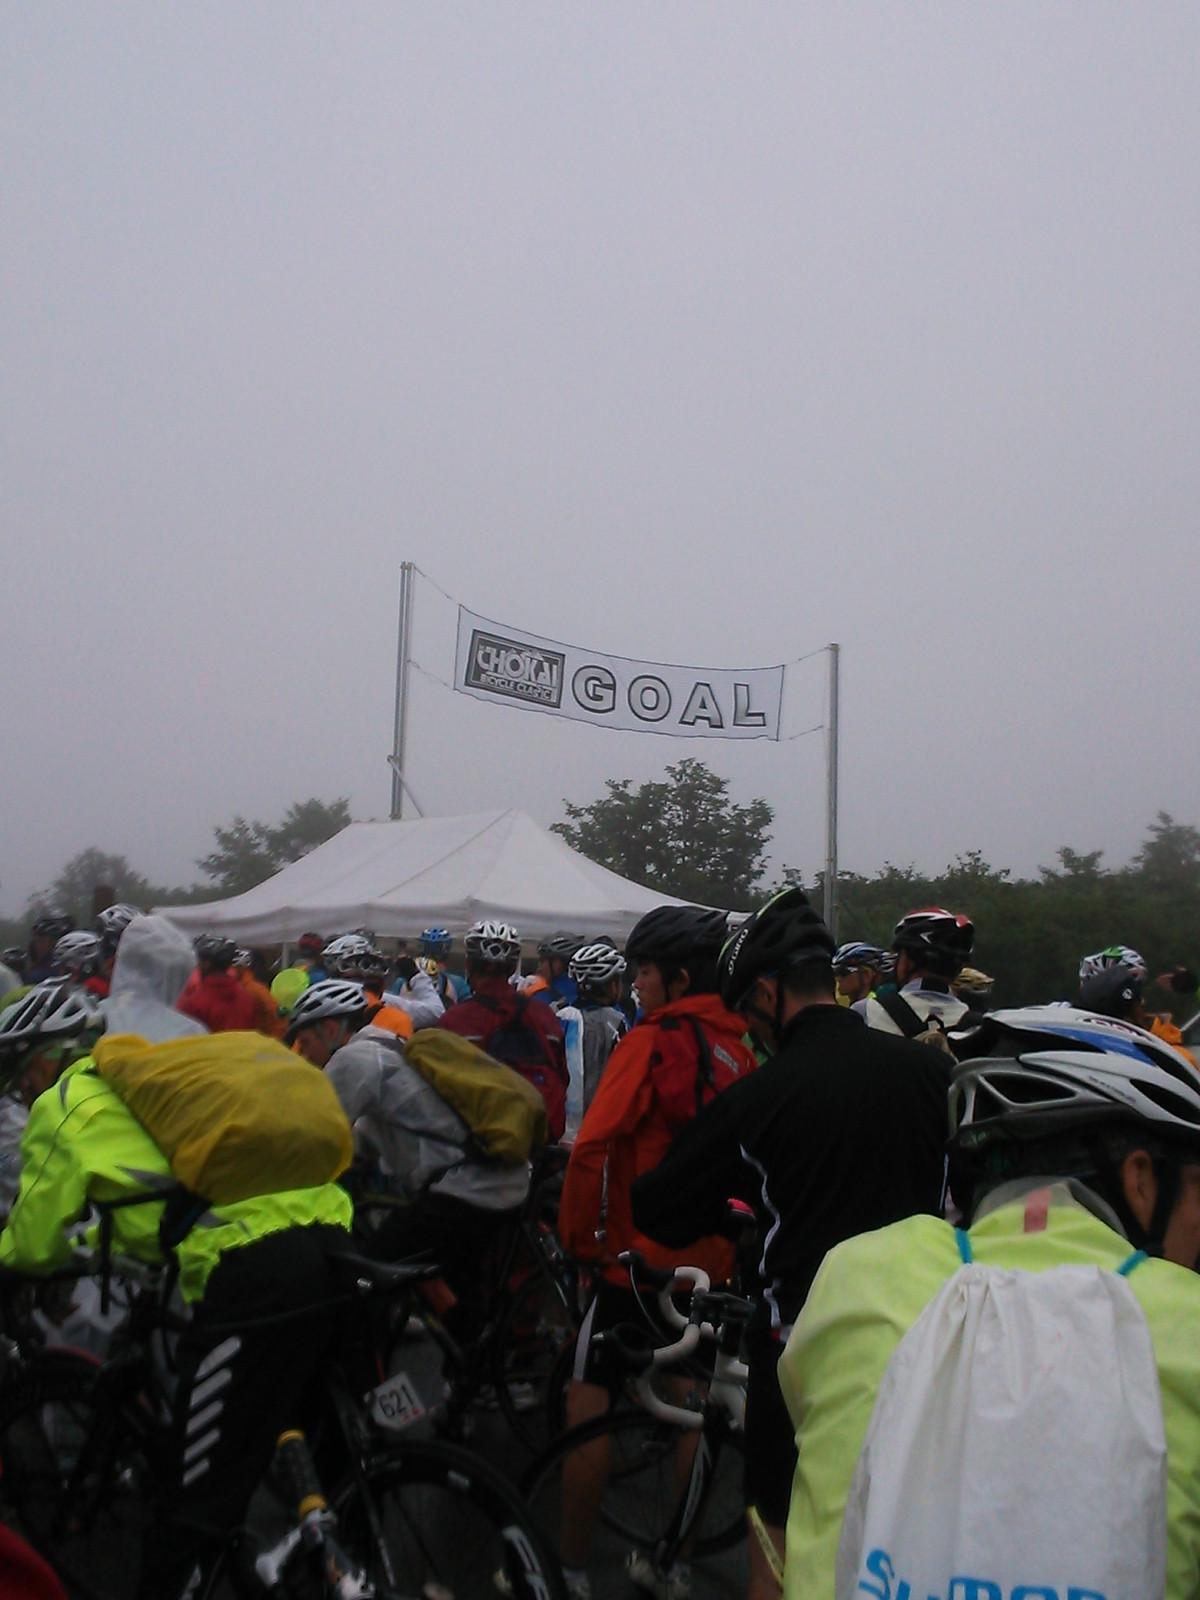 20130728_105000